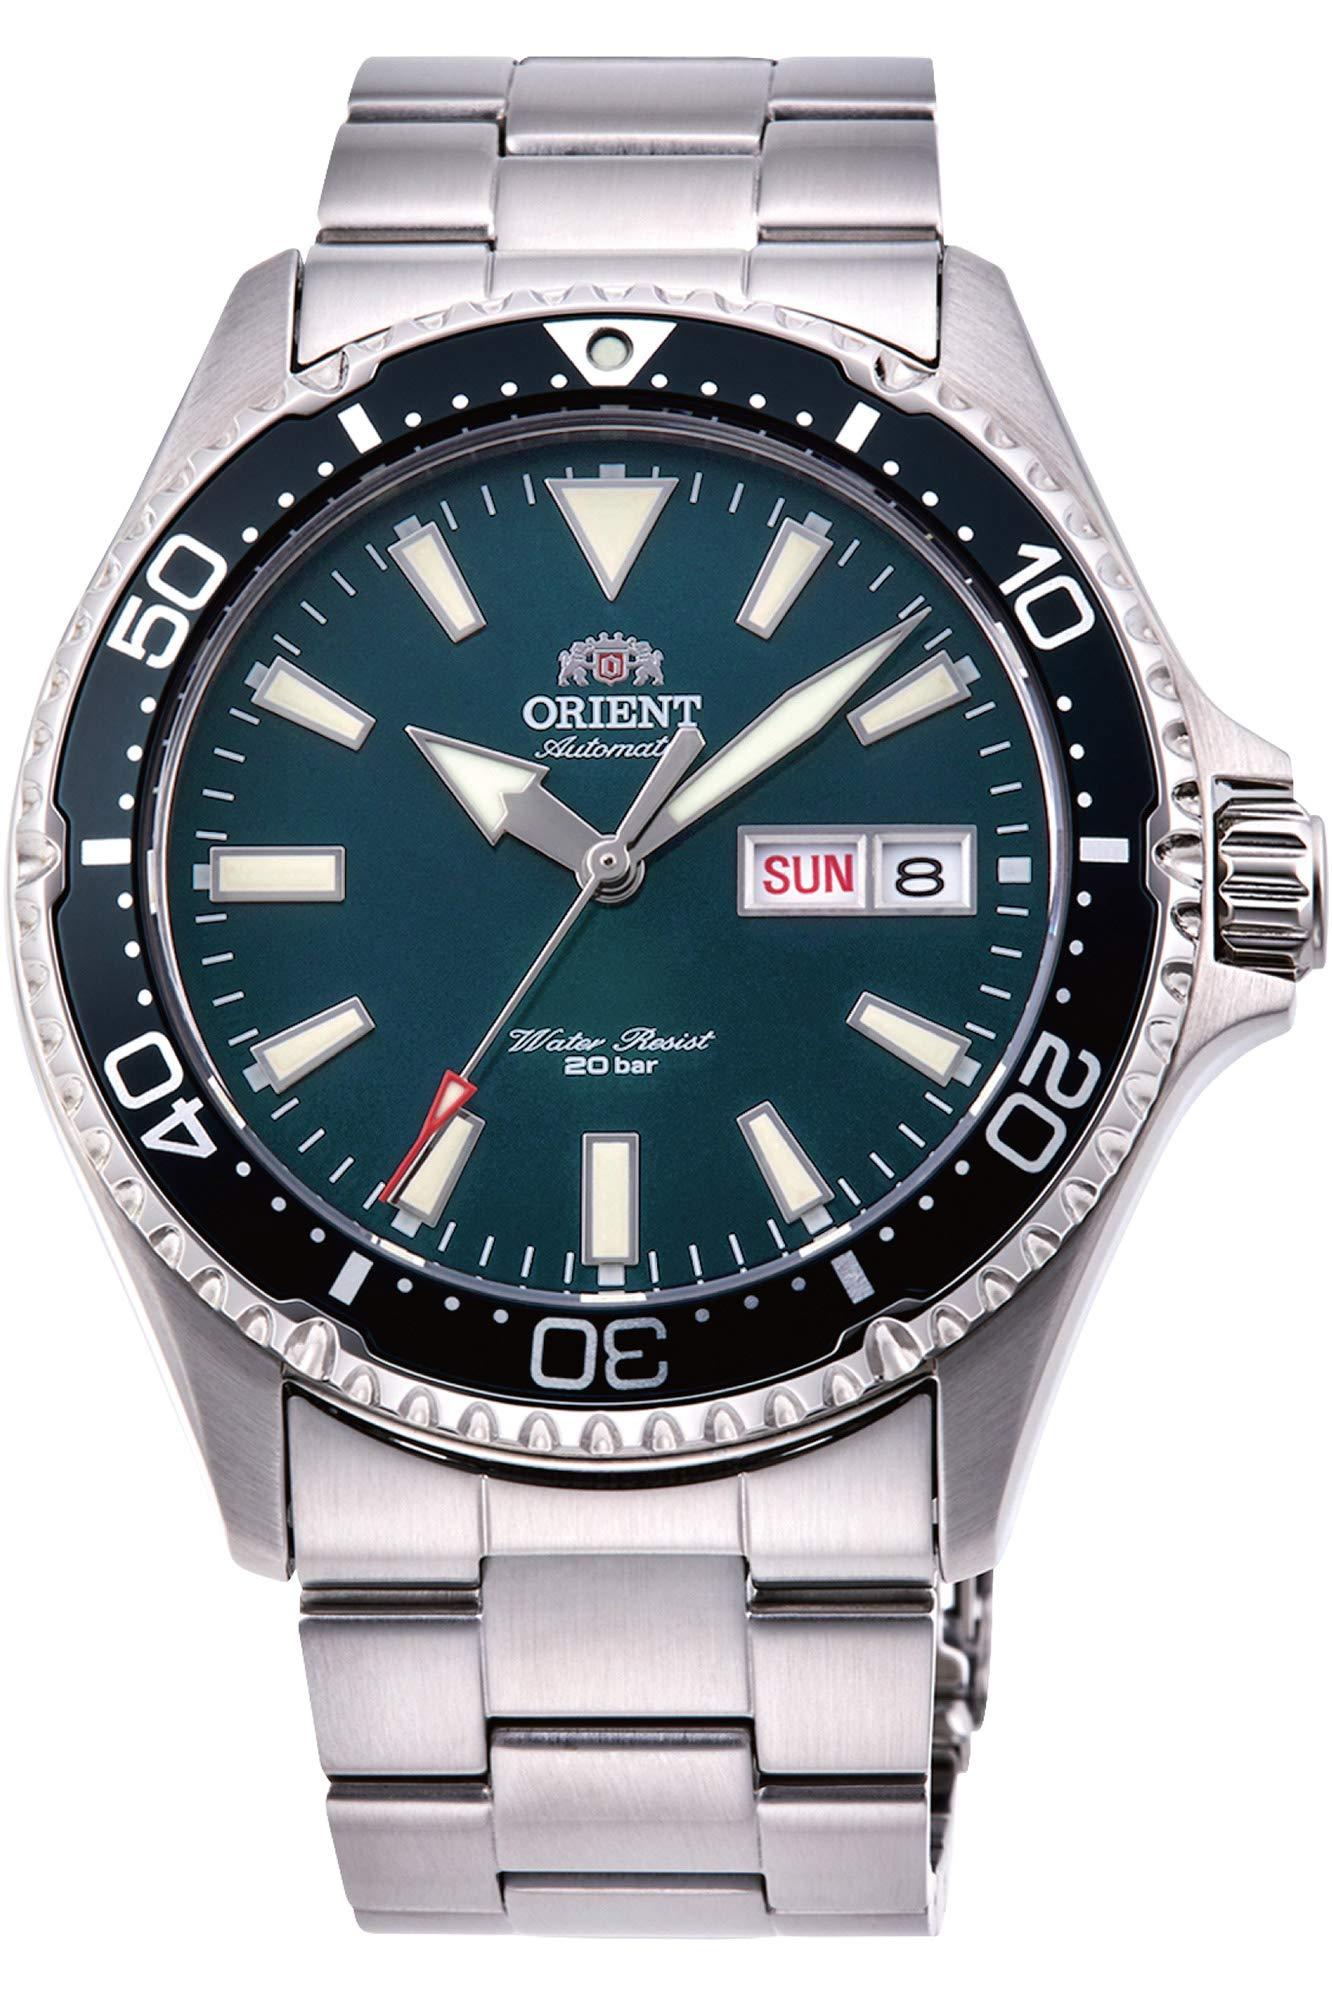 Orient-Unisex-Erwachsene-Analog-Automatik-Uhr-mit-Edelstahl-Armband-RA-AA0004E19B